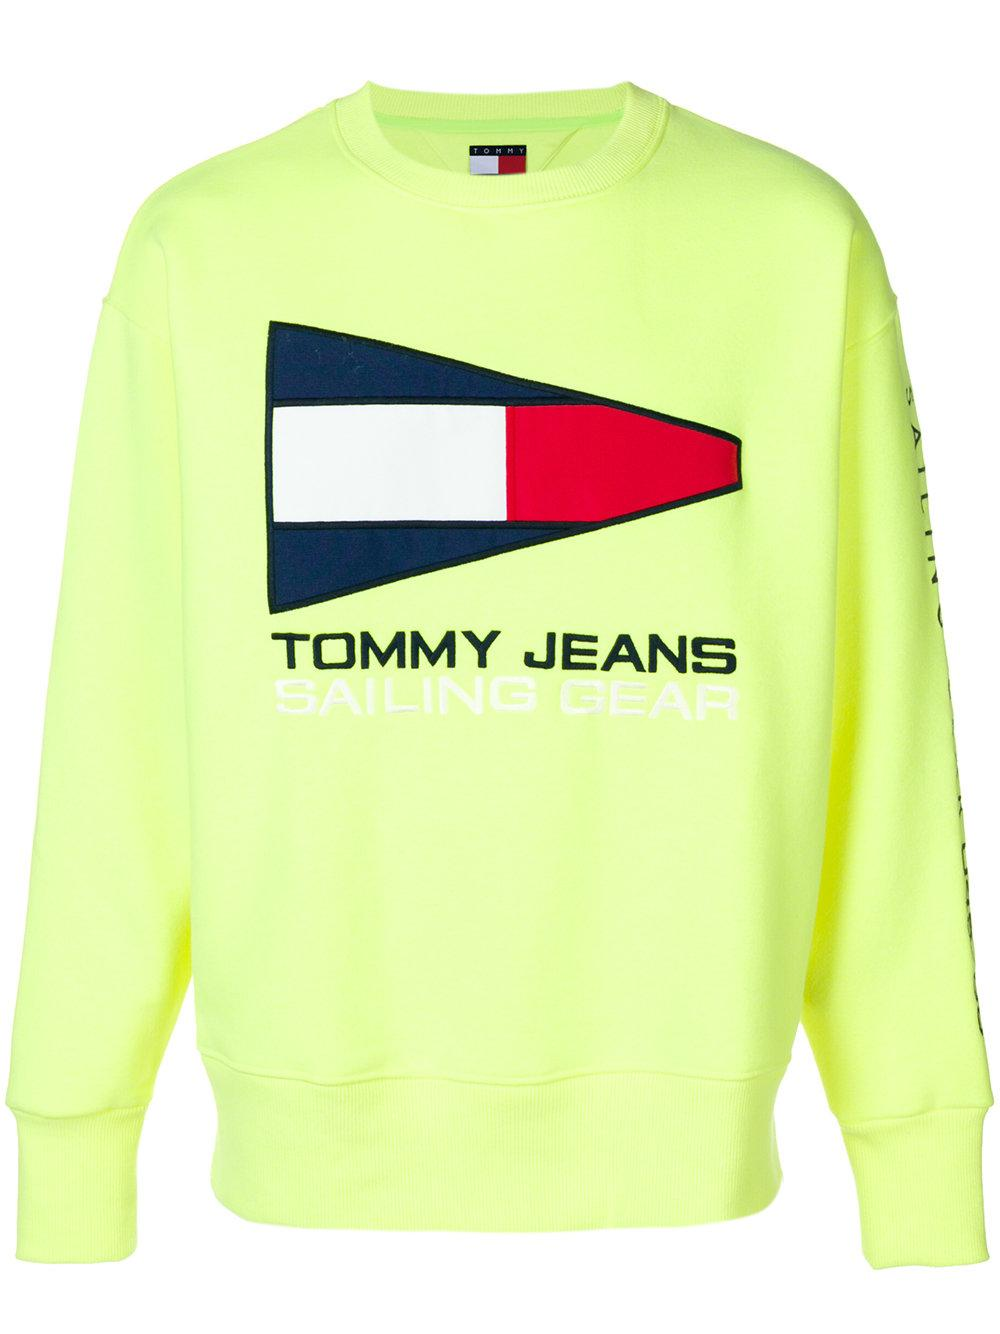 735d622491c Tommy Jeans 90S Sailing Capsule Flag Logo Crew Neck Sweatshirt In Neon  Yellow - Yellow